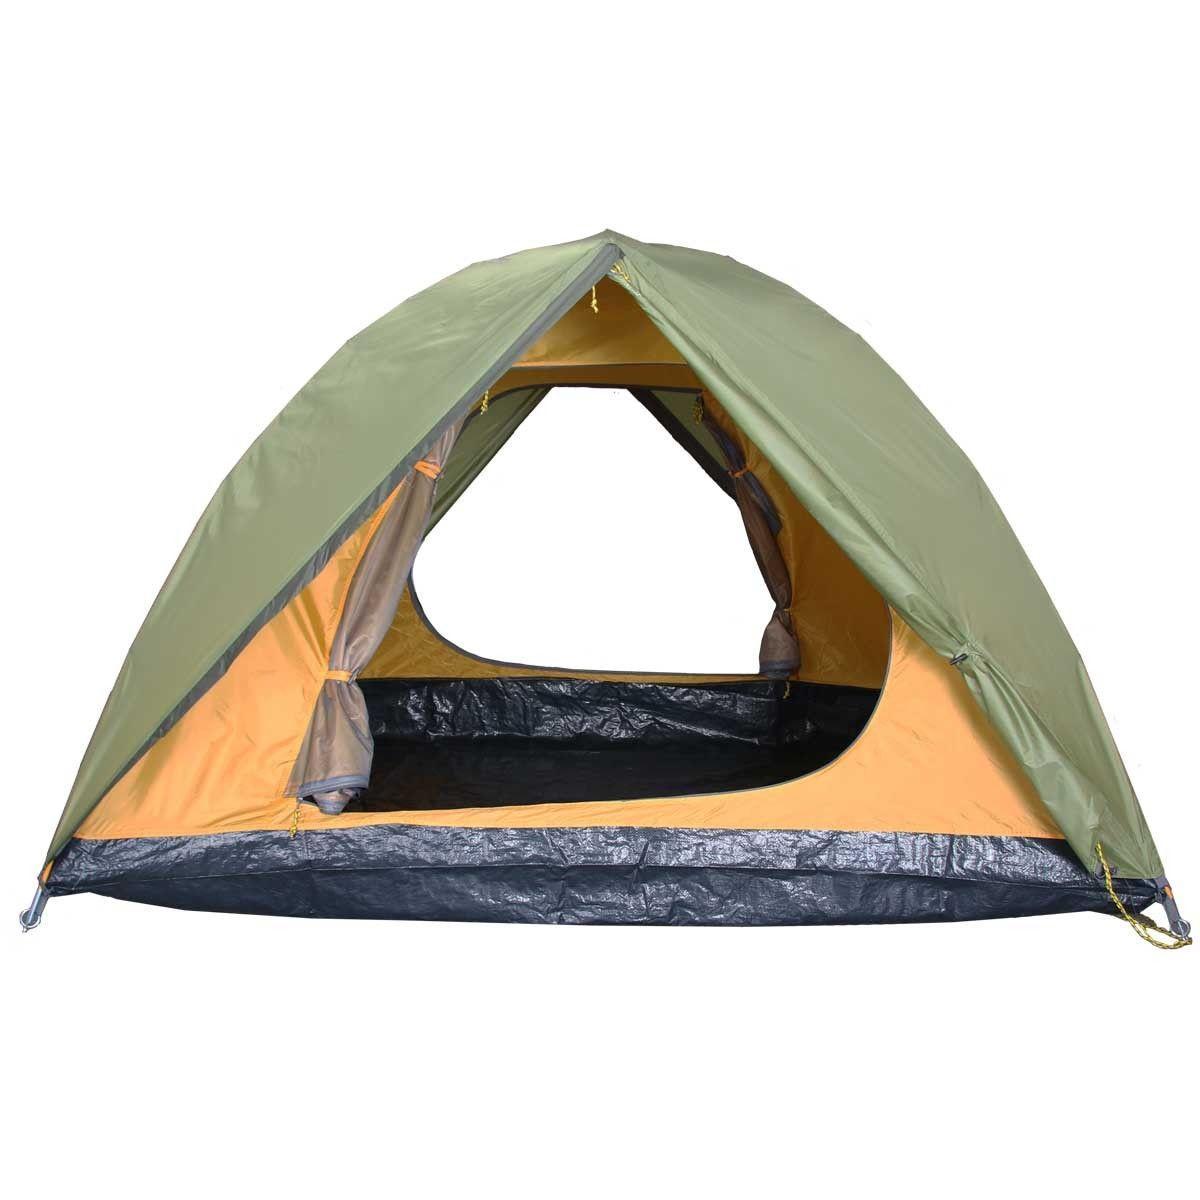 Палатка BREEZE-3 Helios зеленый HS-2370-3 - фото 3